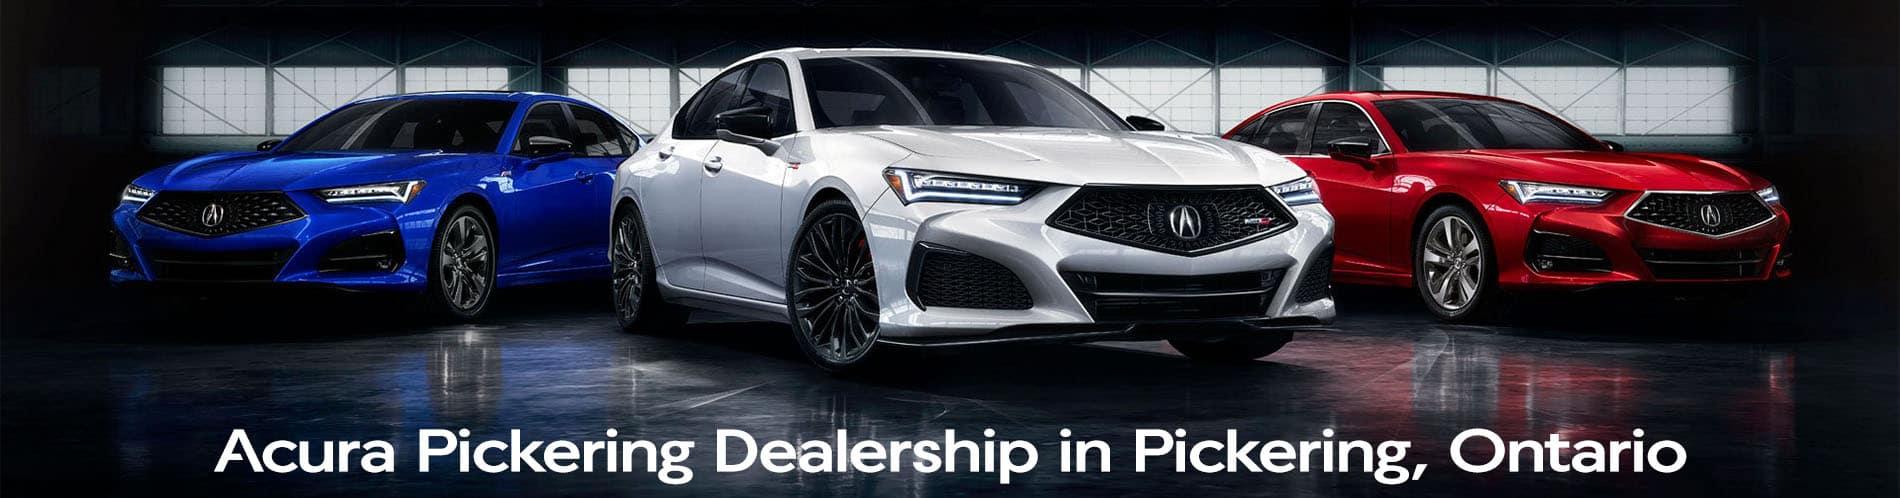 Acura Pickering Dealership Located in Pickering Ontario